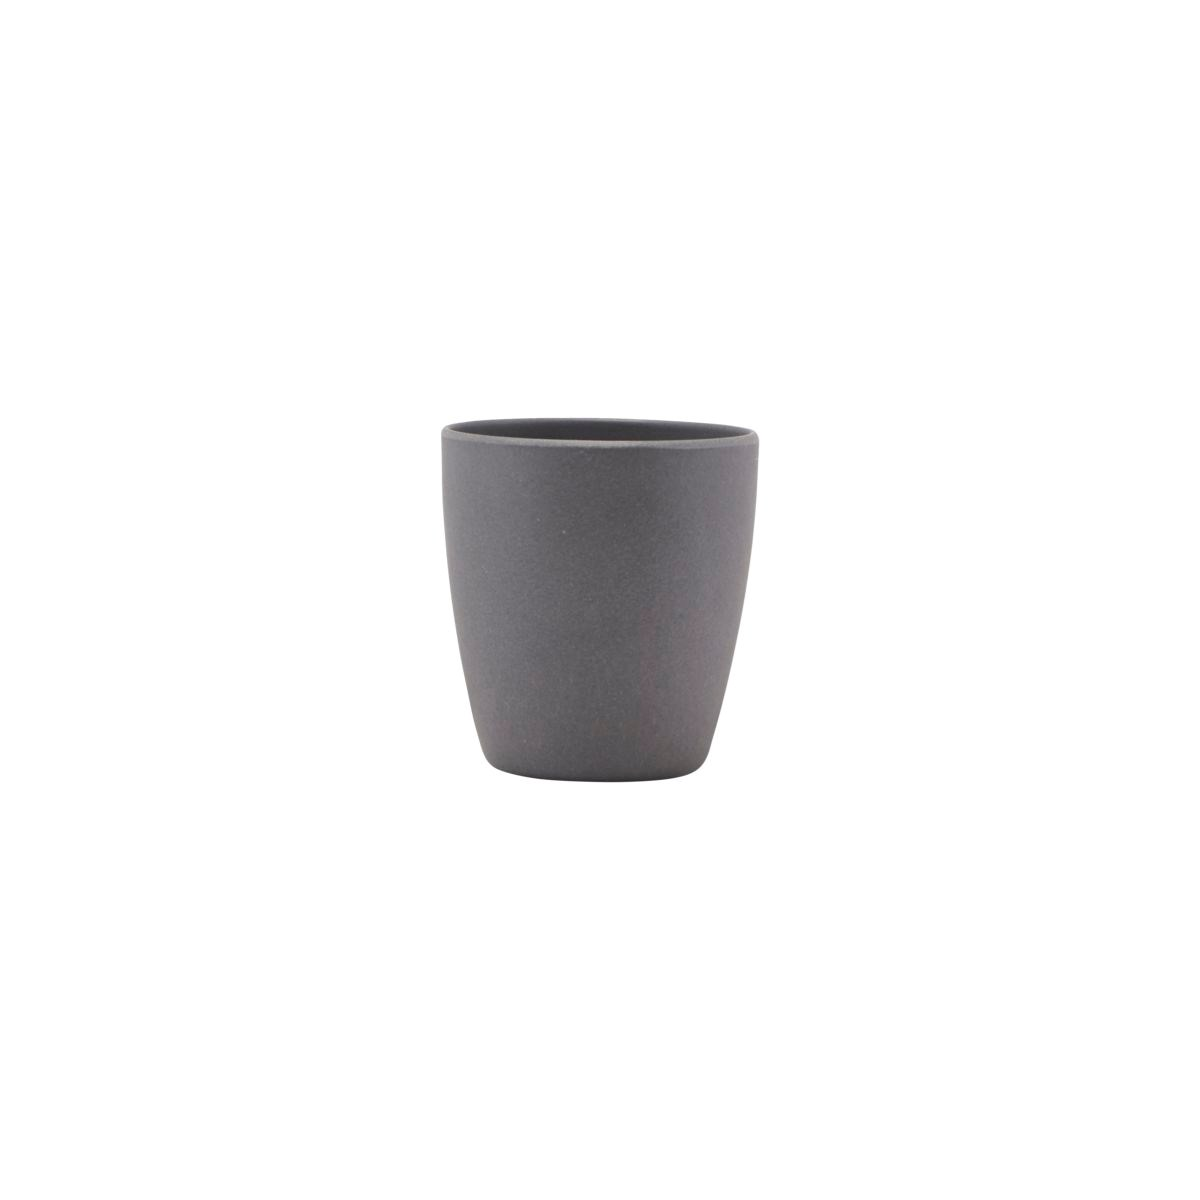 Hrnek Picnic P.8 cm tmavě šedý_2